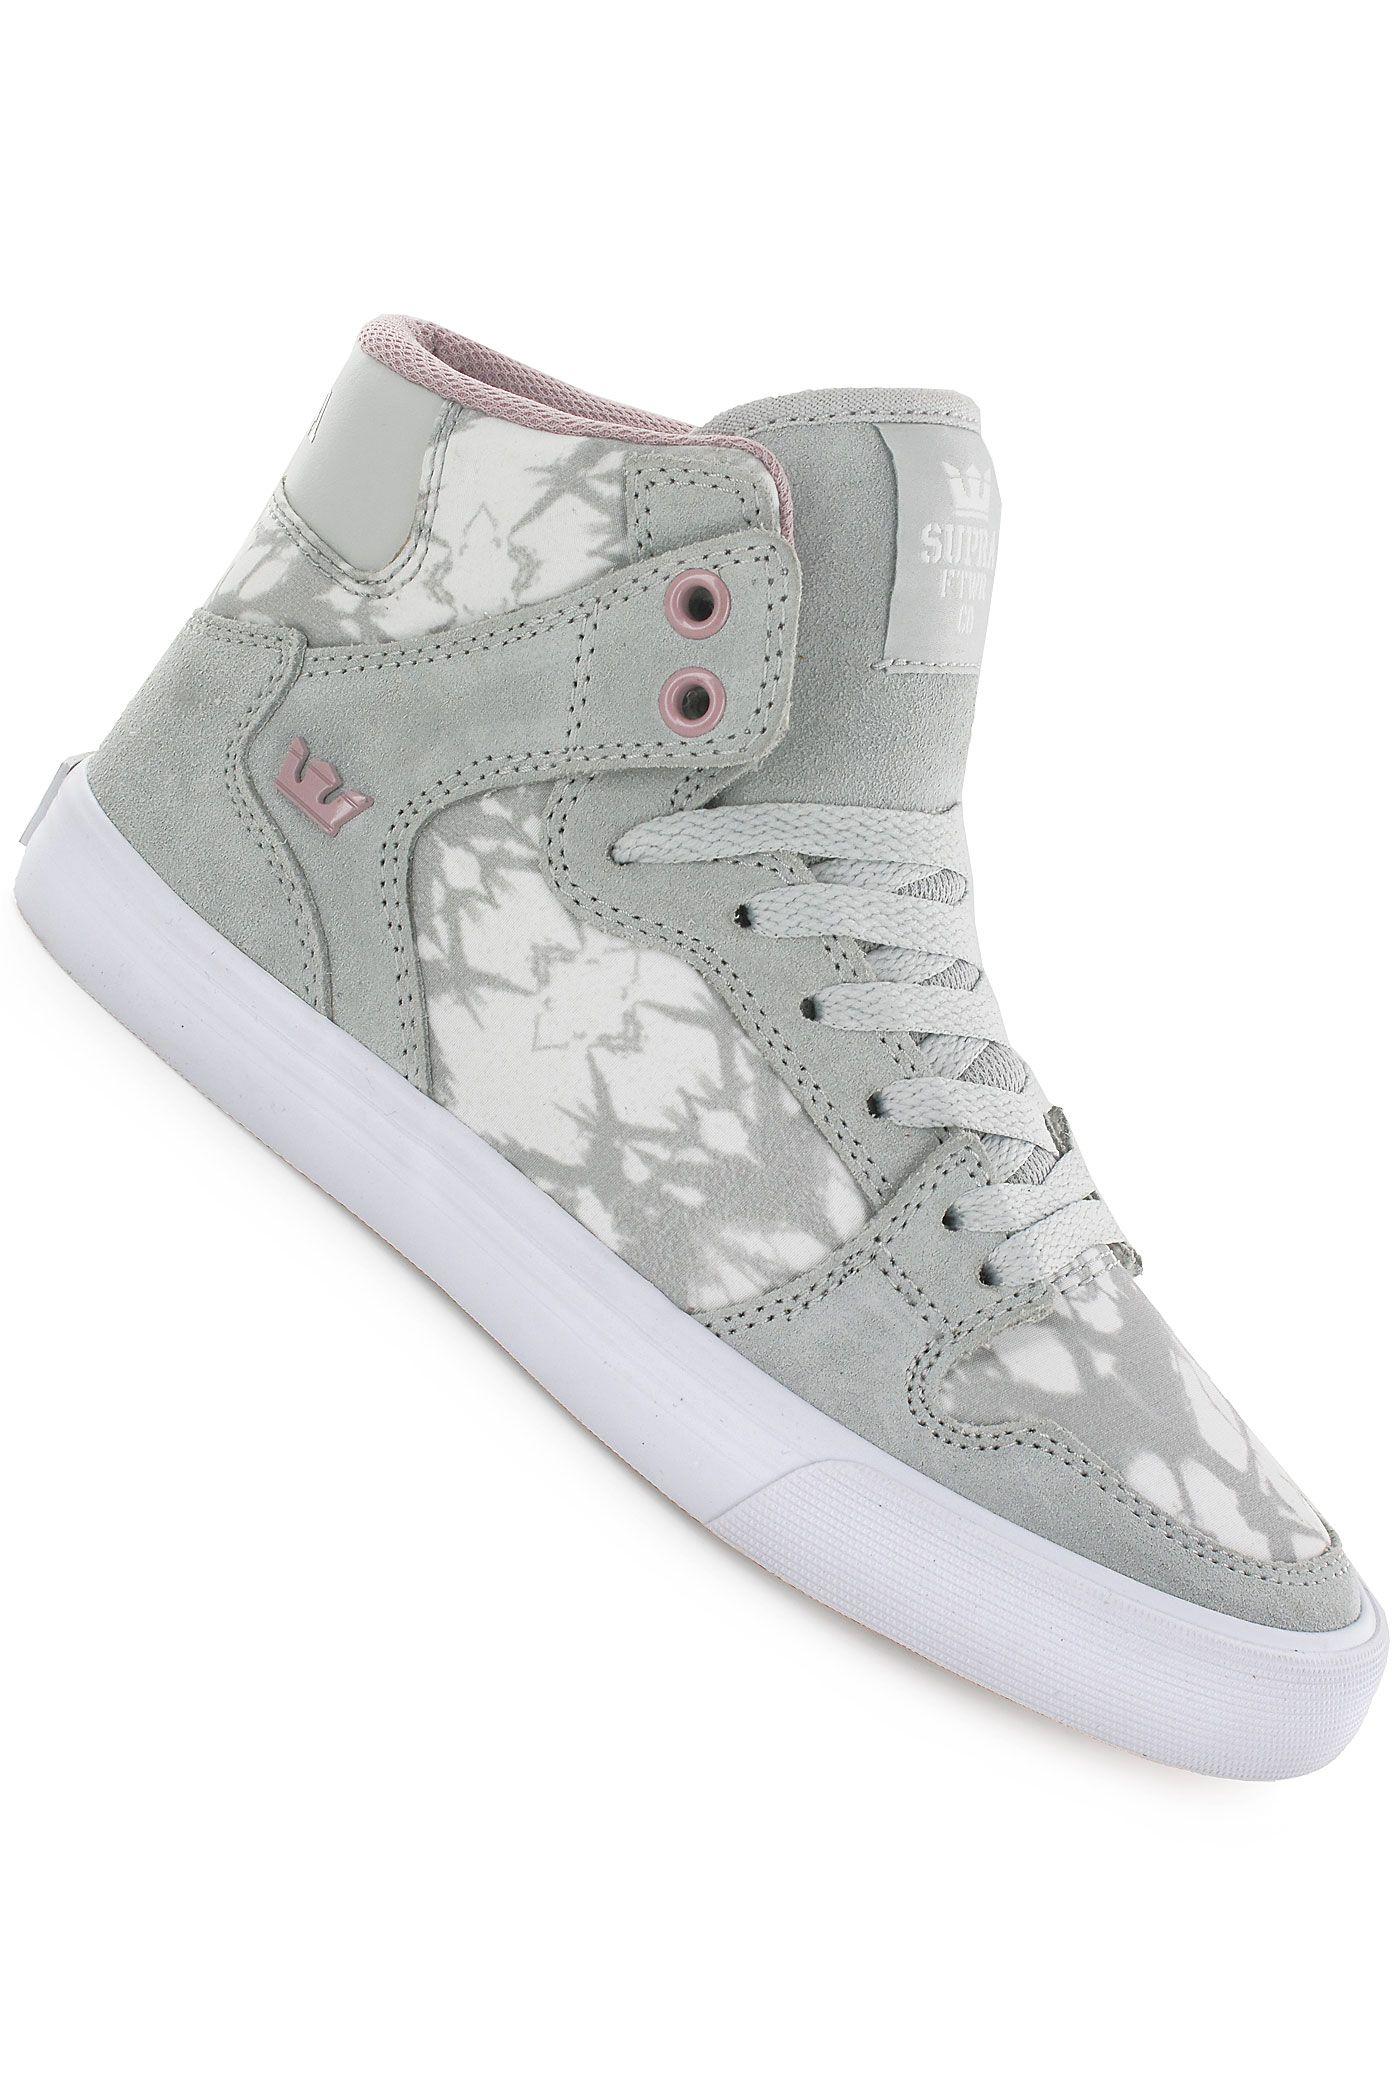 Supra Vaider Schuh | #skatedeluxe #sk8dlx #shoe #supra #sneaker #turnschuh #streetstyle